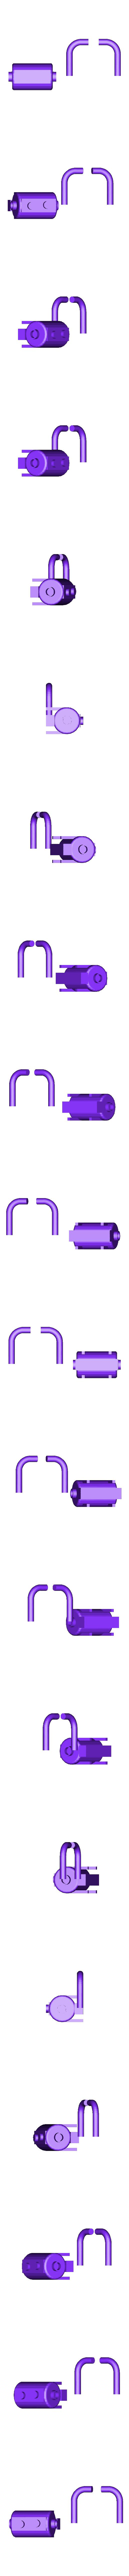 Diesel_Fuel_System.stl Download free STL file HO Scale Diesel Refueling Station • 3D printing template, kabrumble